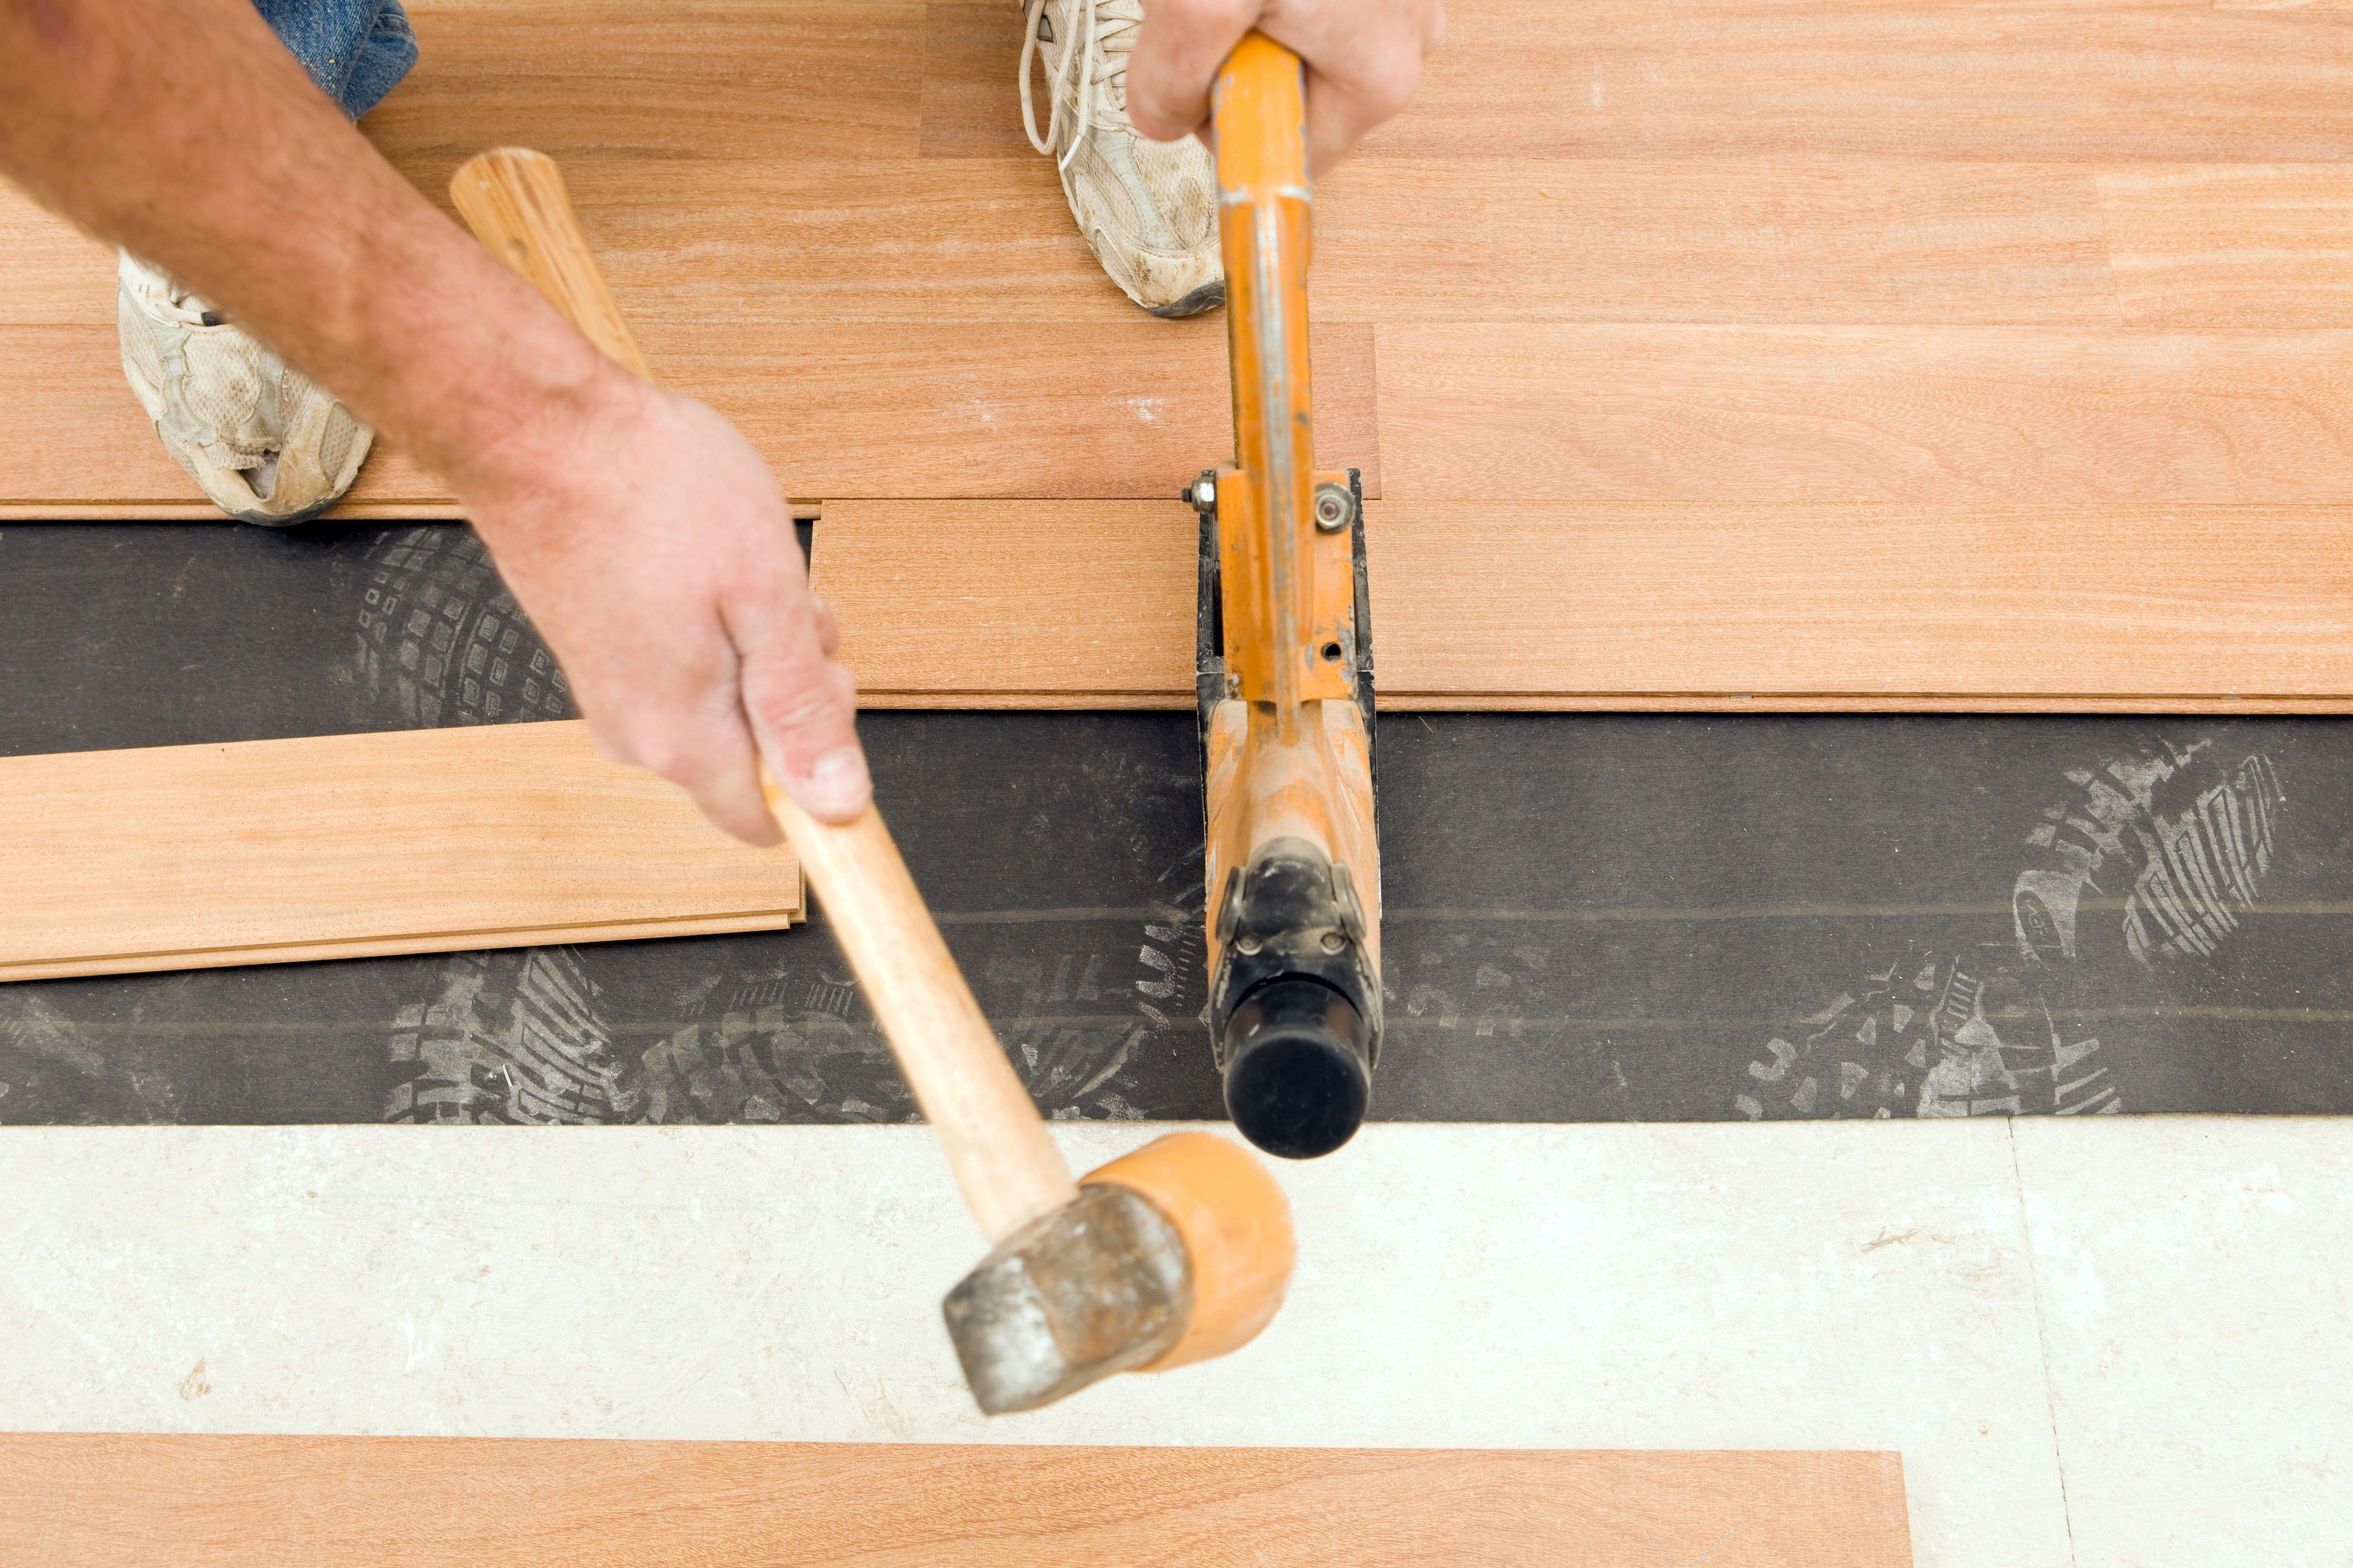 hardwood flooring price list of the hardest wood flooring you can buy with regard to worker installing new cumuru hardwood floor 186852280 5827f3bc5f9b58d5b11372fc